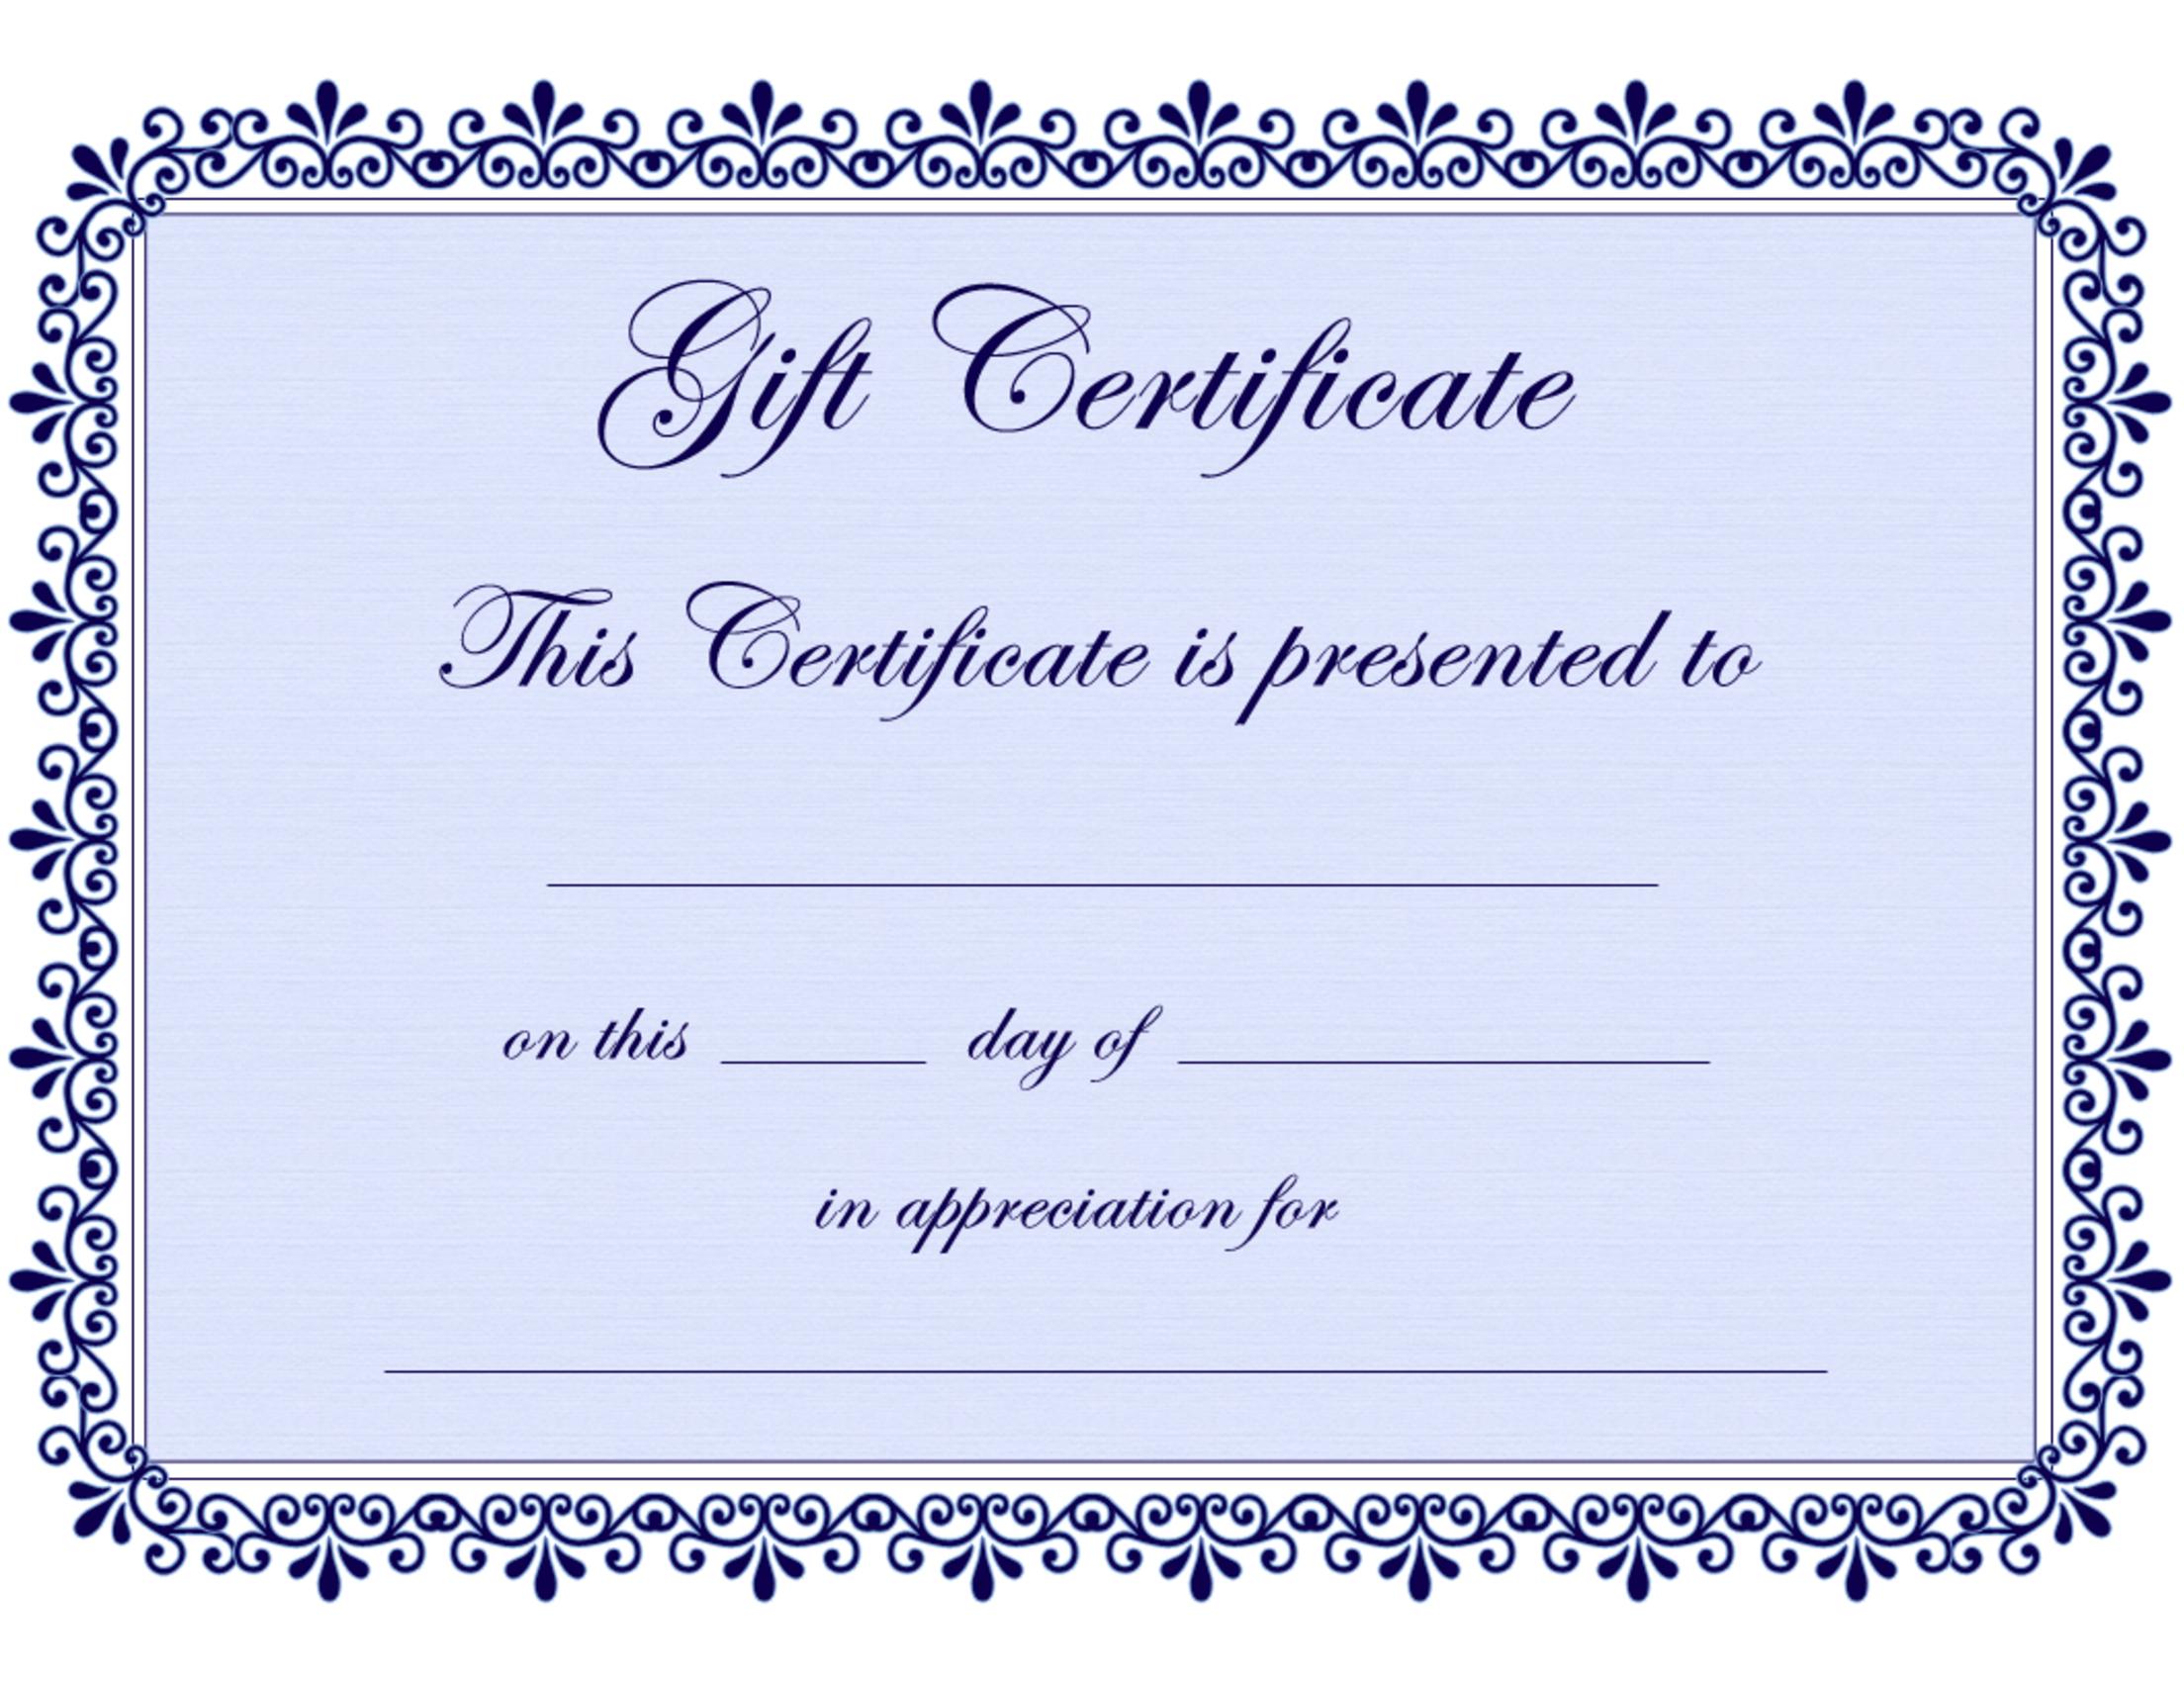 Certificate Templates | Gift Certificate Template Free - Pdf - Free Printable Tattoo Gift Certificates